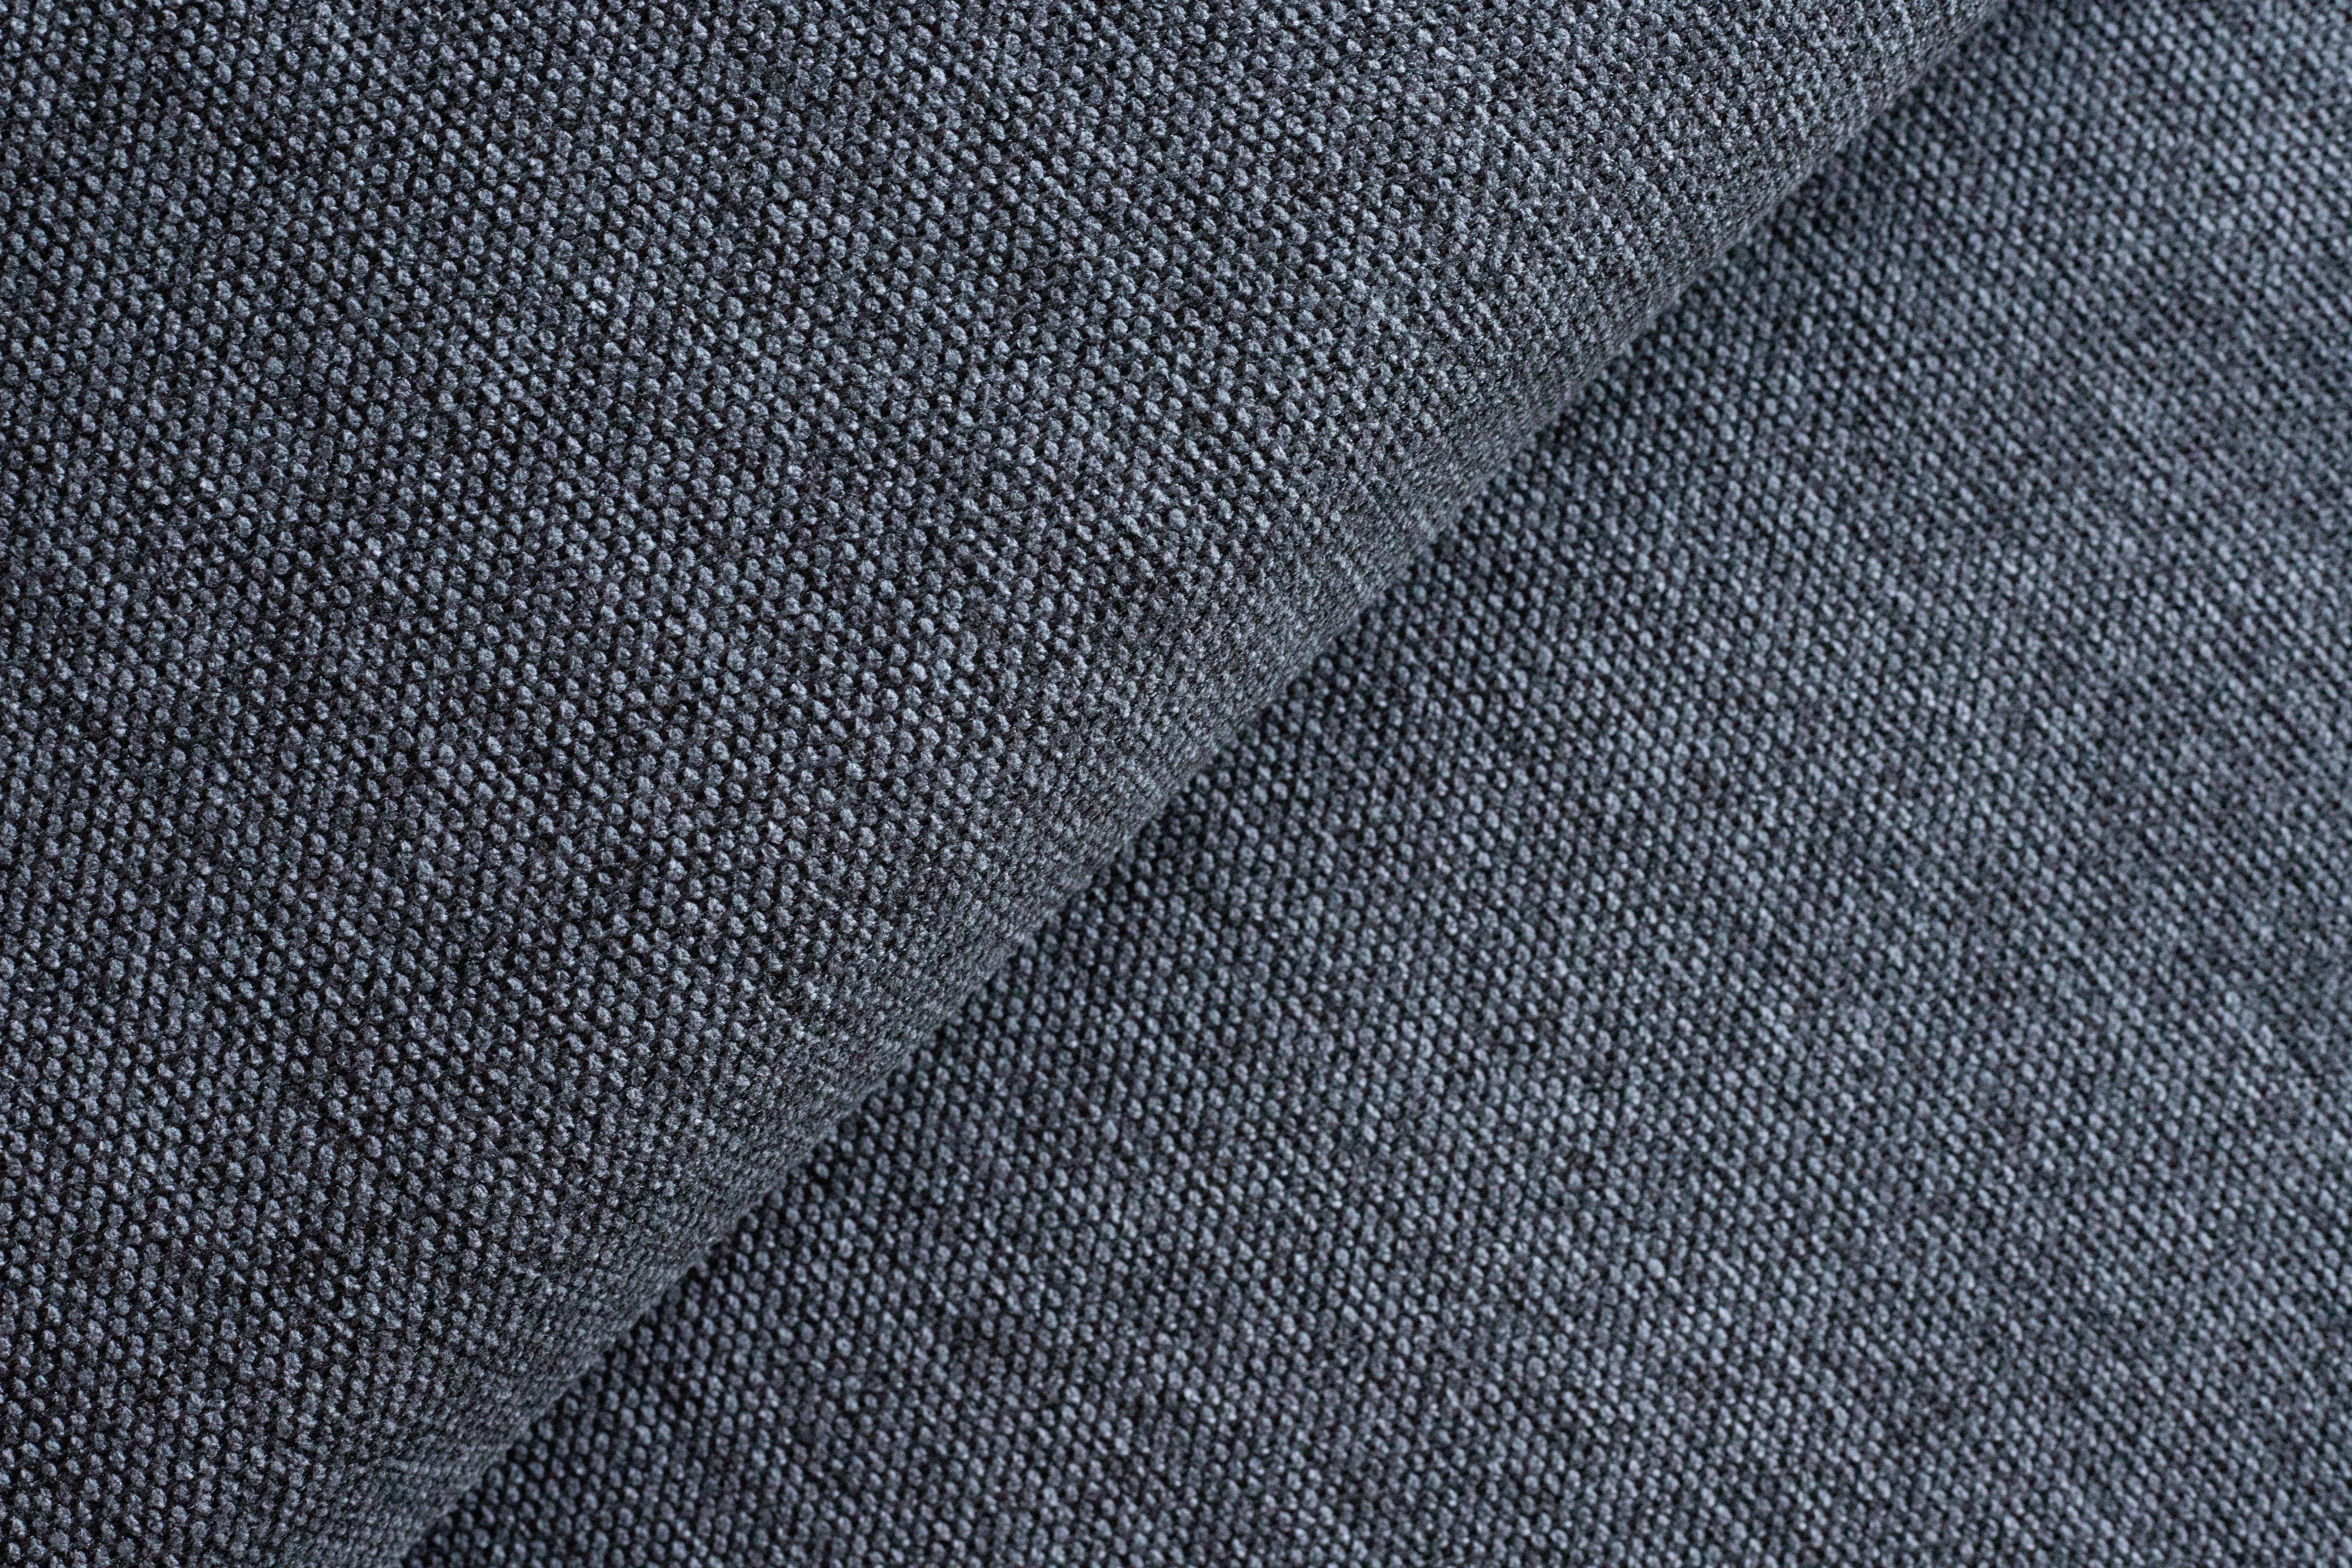 Potocki tkaniny: urban 6 300dpi